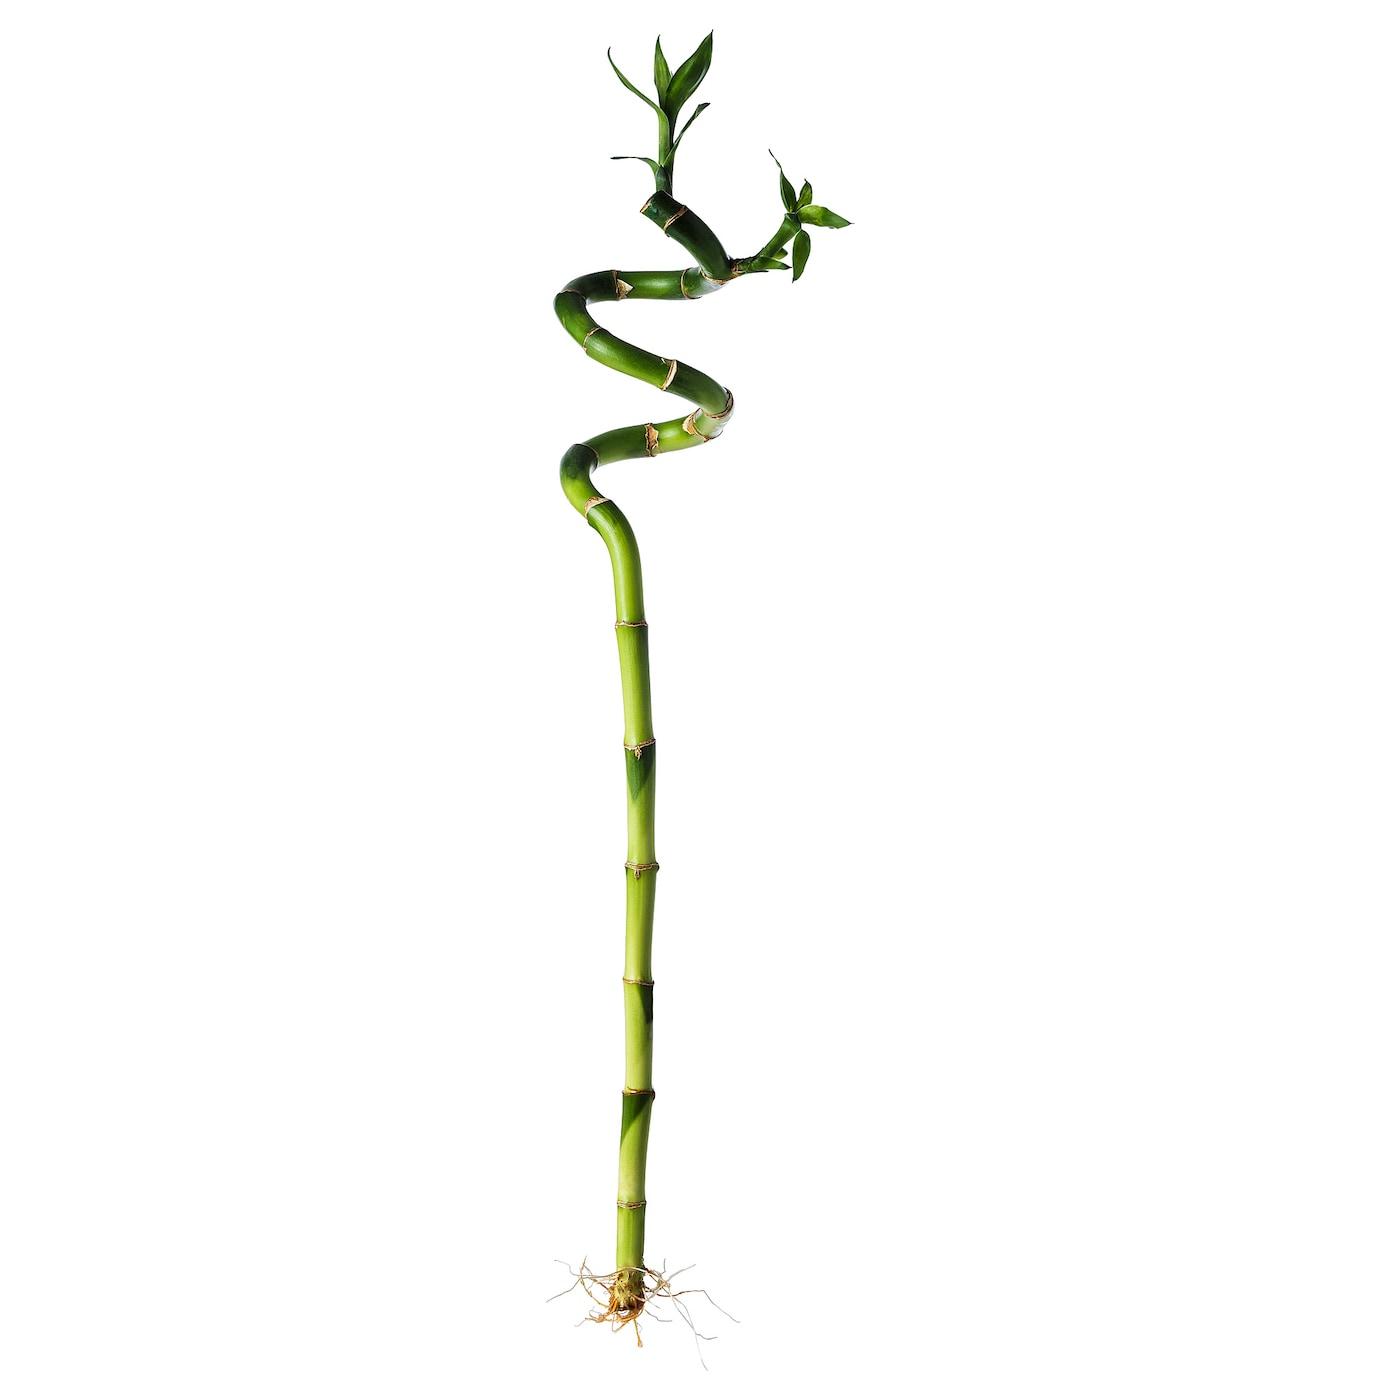 house plants & outdoor plants | ikea ireland - dublin